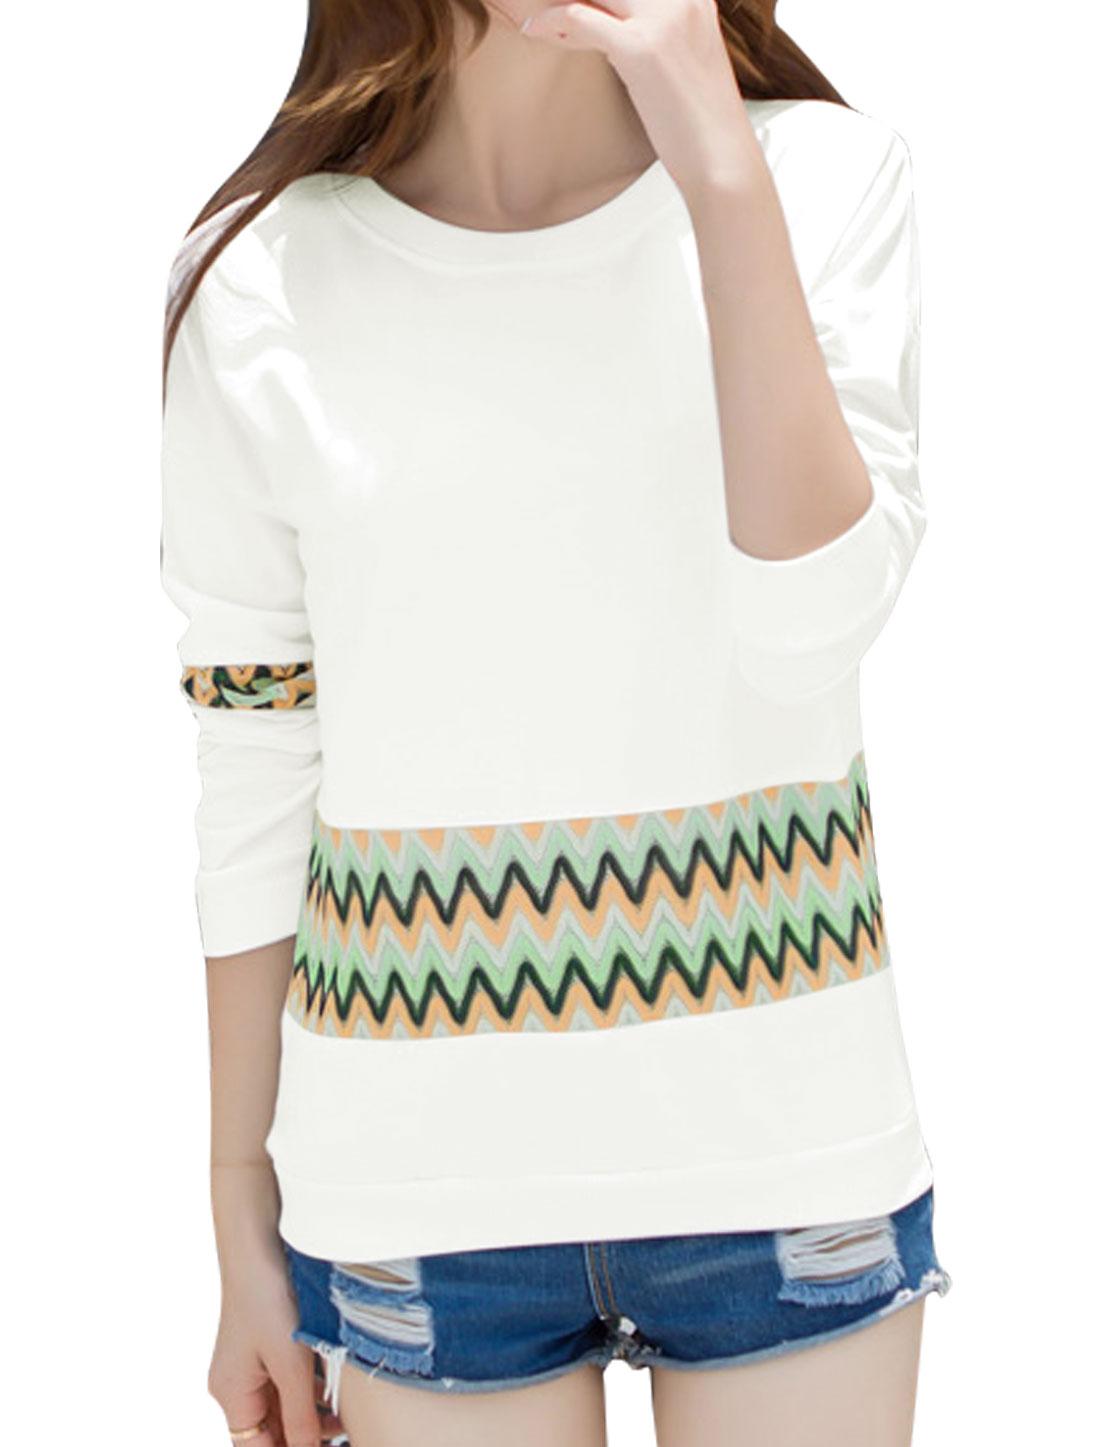 Women Long Sleeves Zig-zag Design Mesh Panel Sweatshirt White M